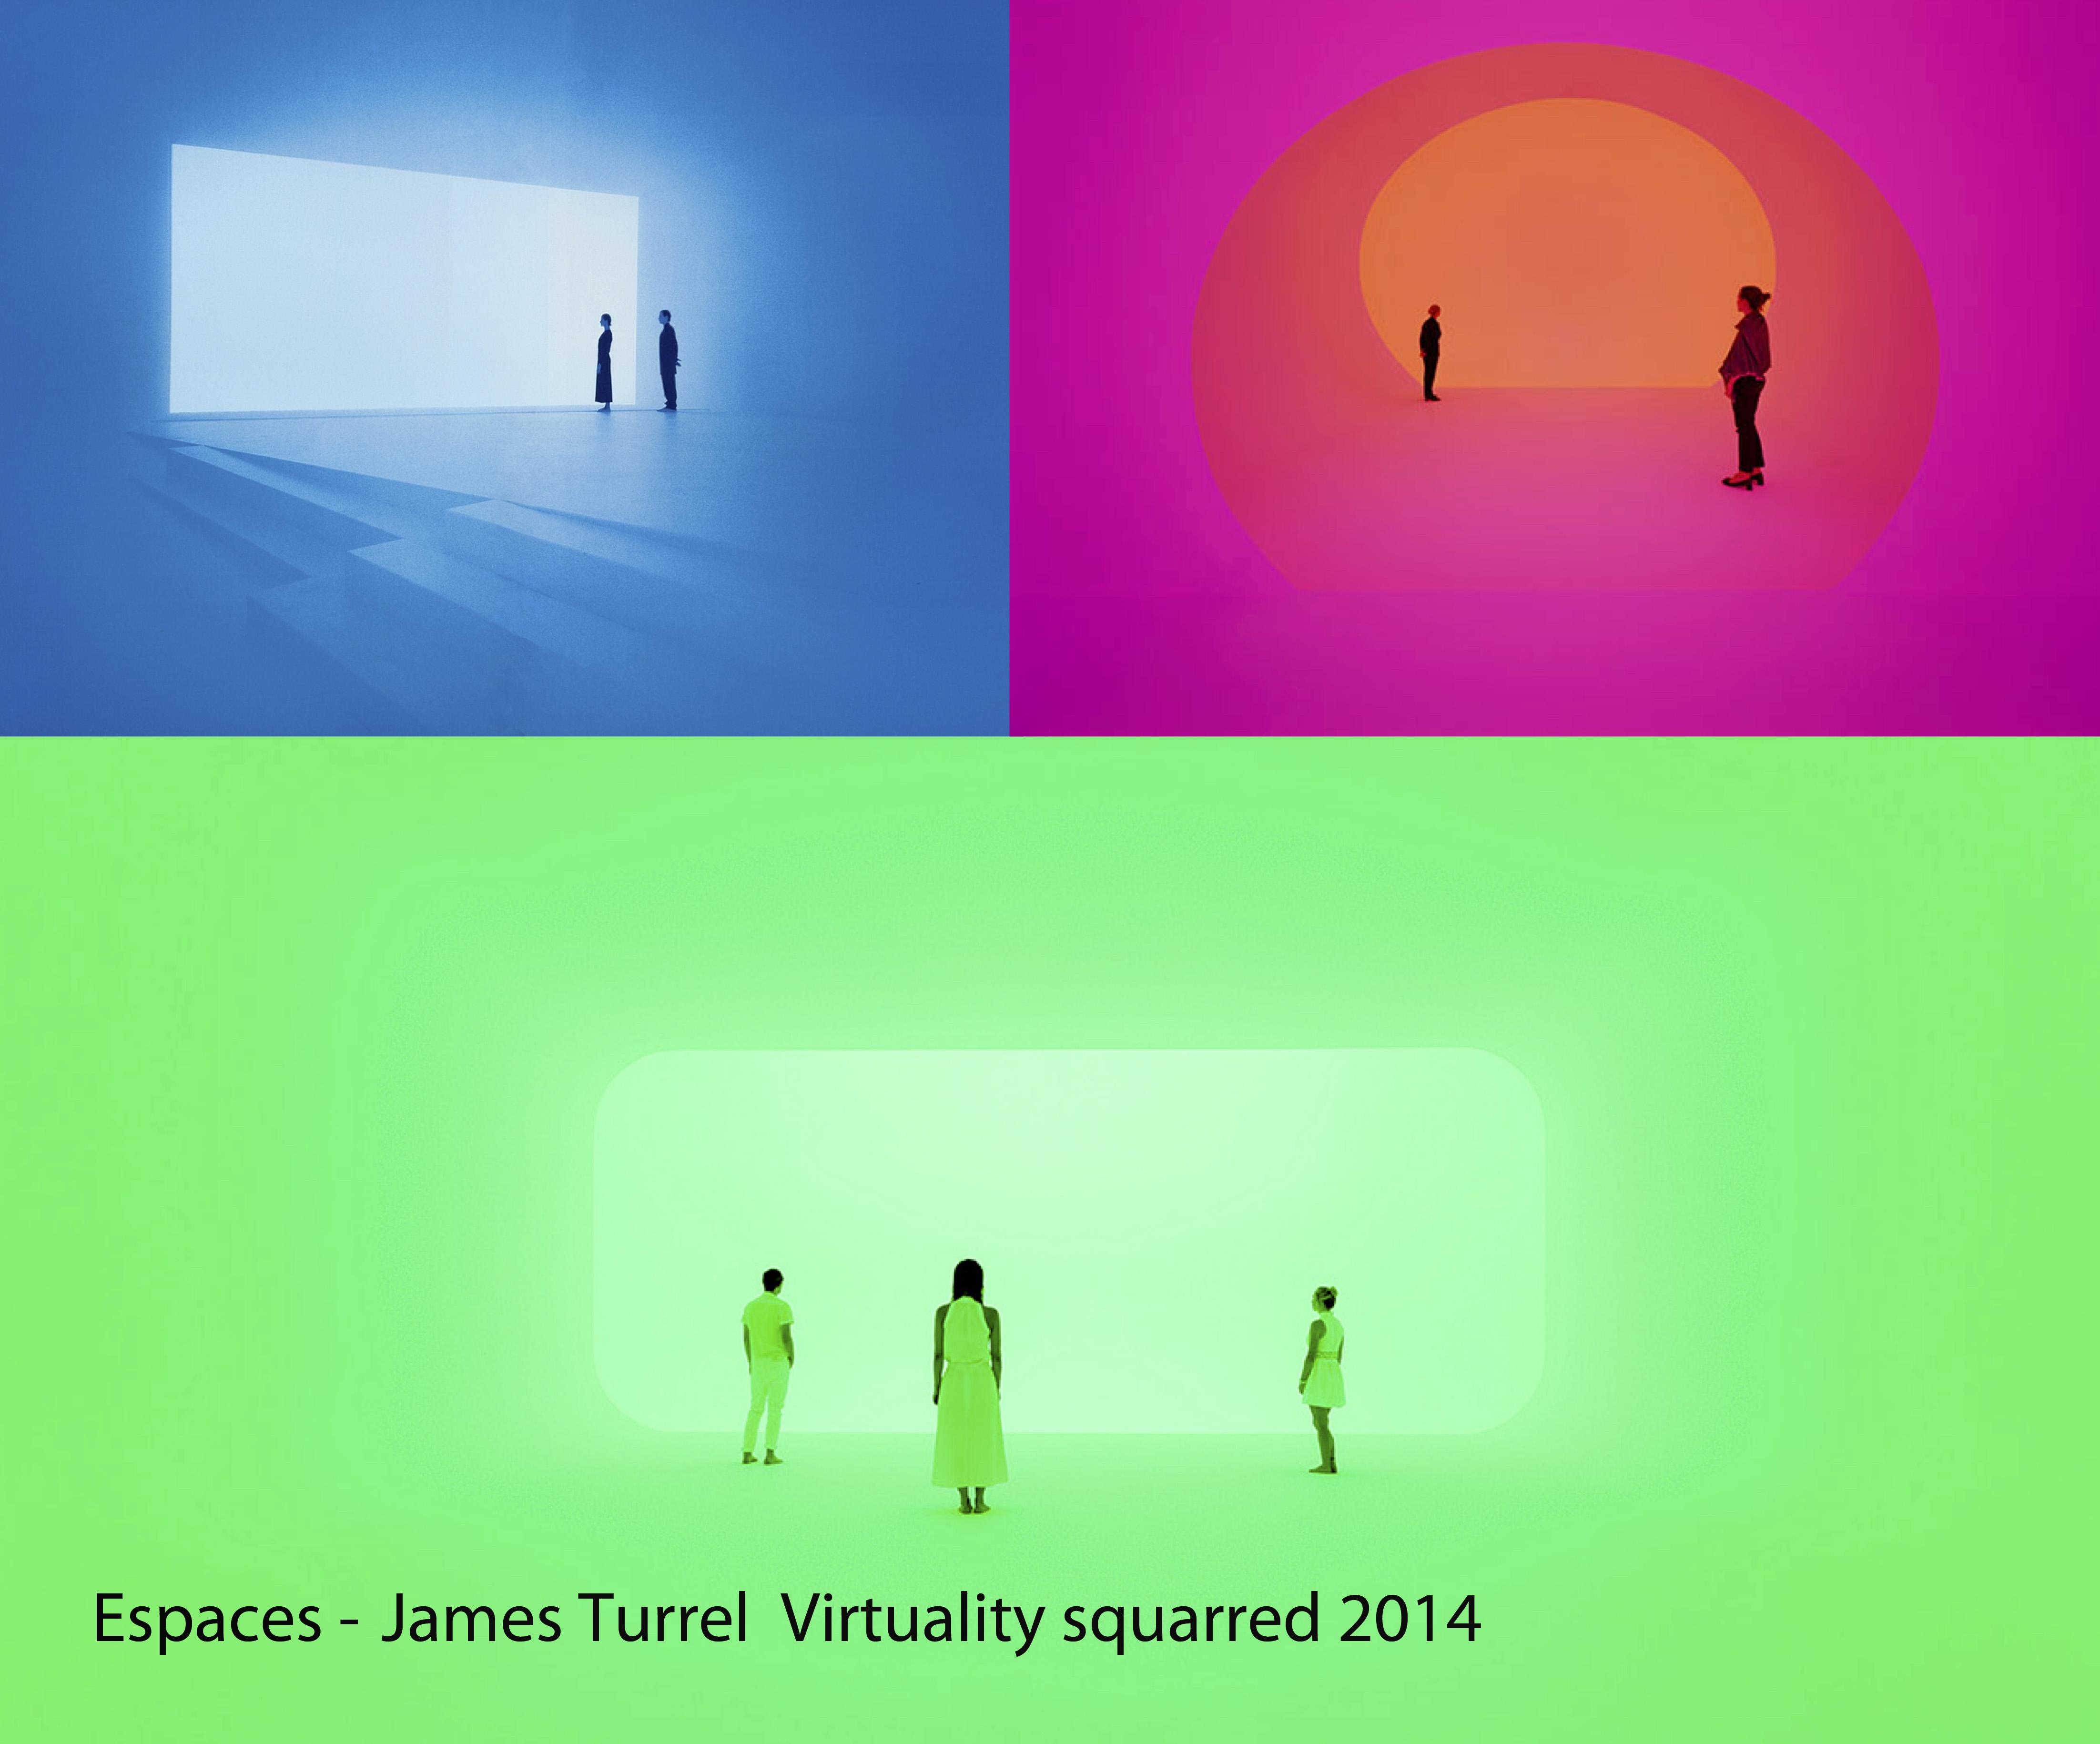 espaces_de_james_turrell_virtuality_squared_2014_ganzfeld_built_space_led_lights.jpg